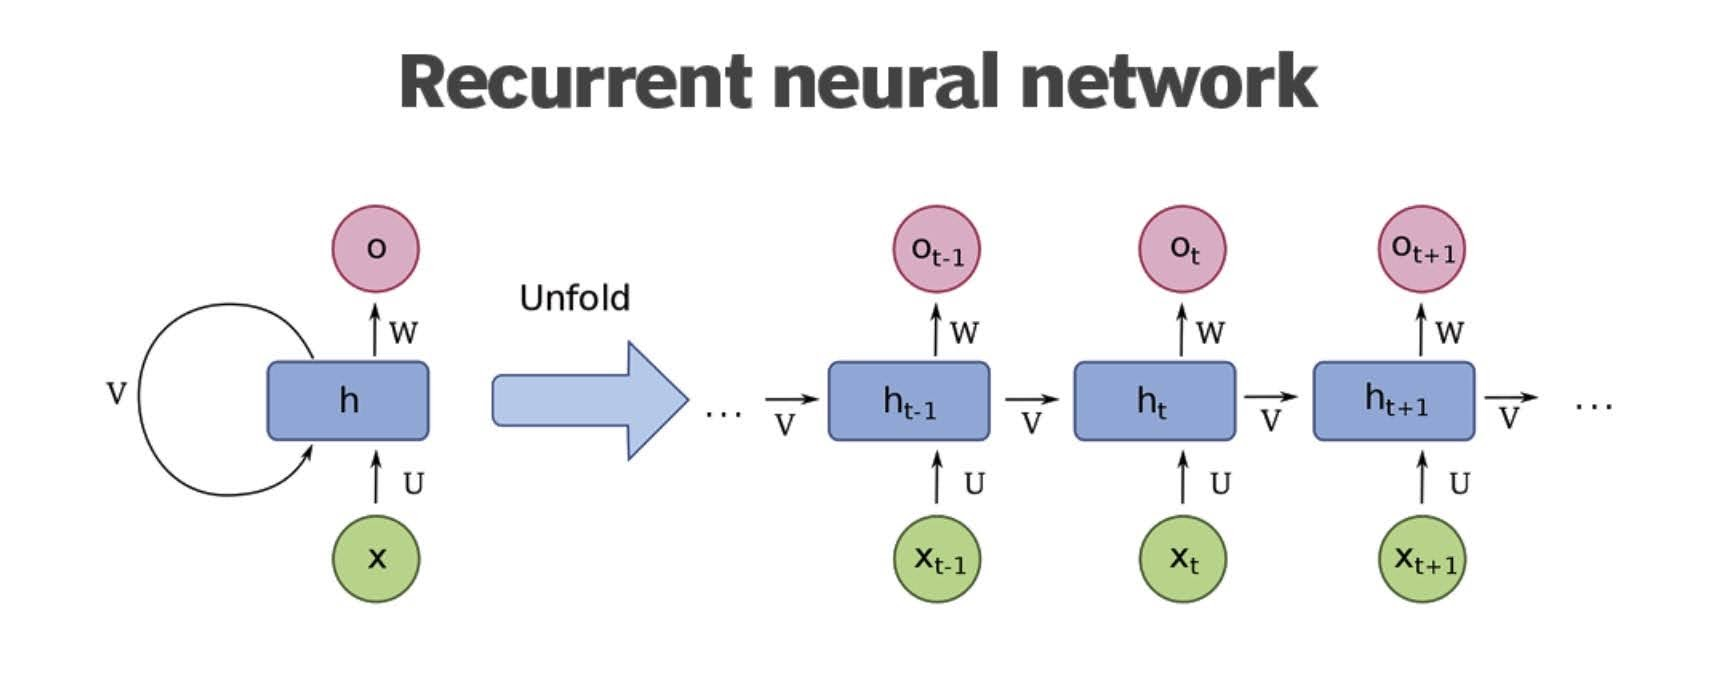 Recurrent neural network